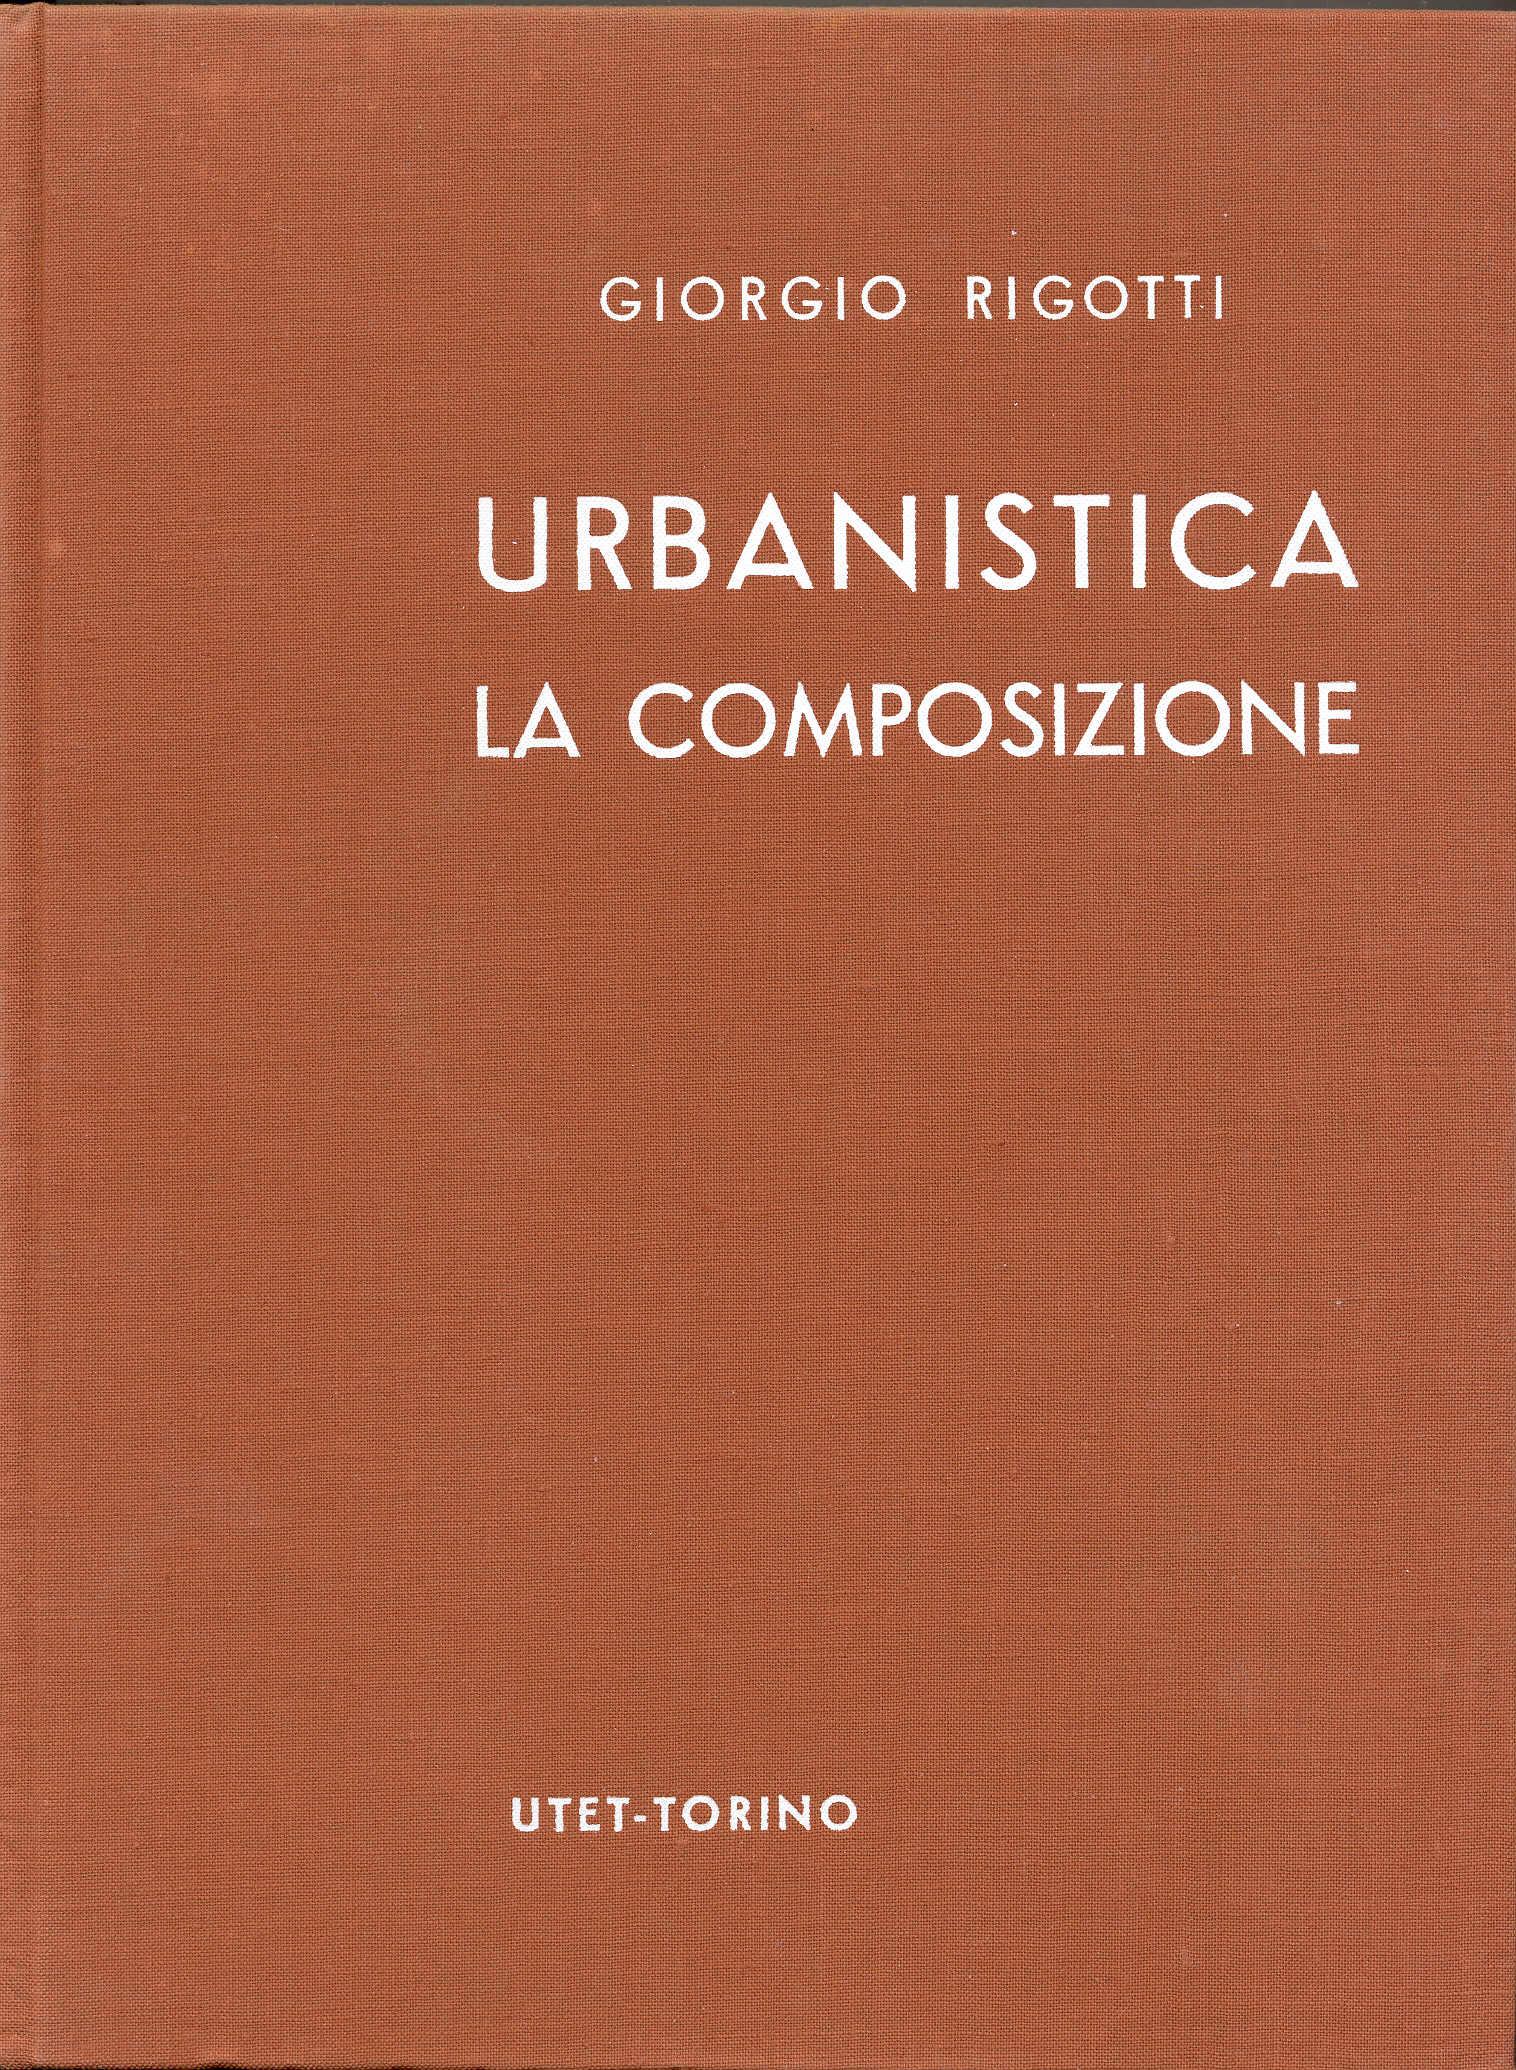 urbanistca